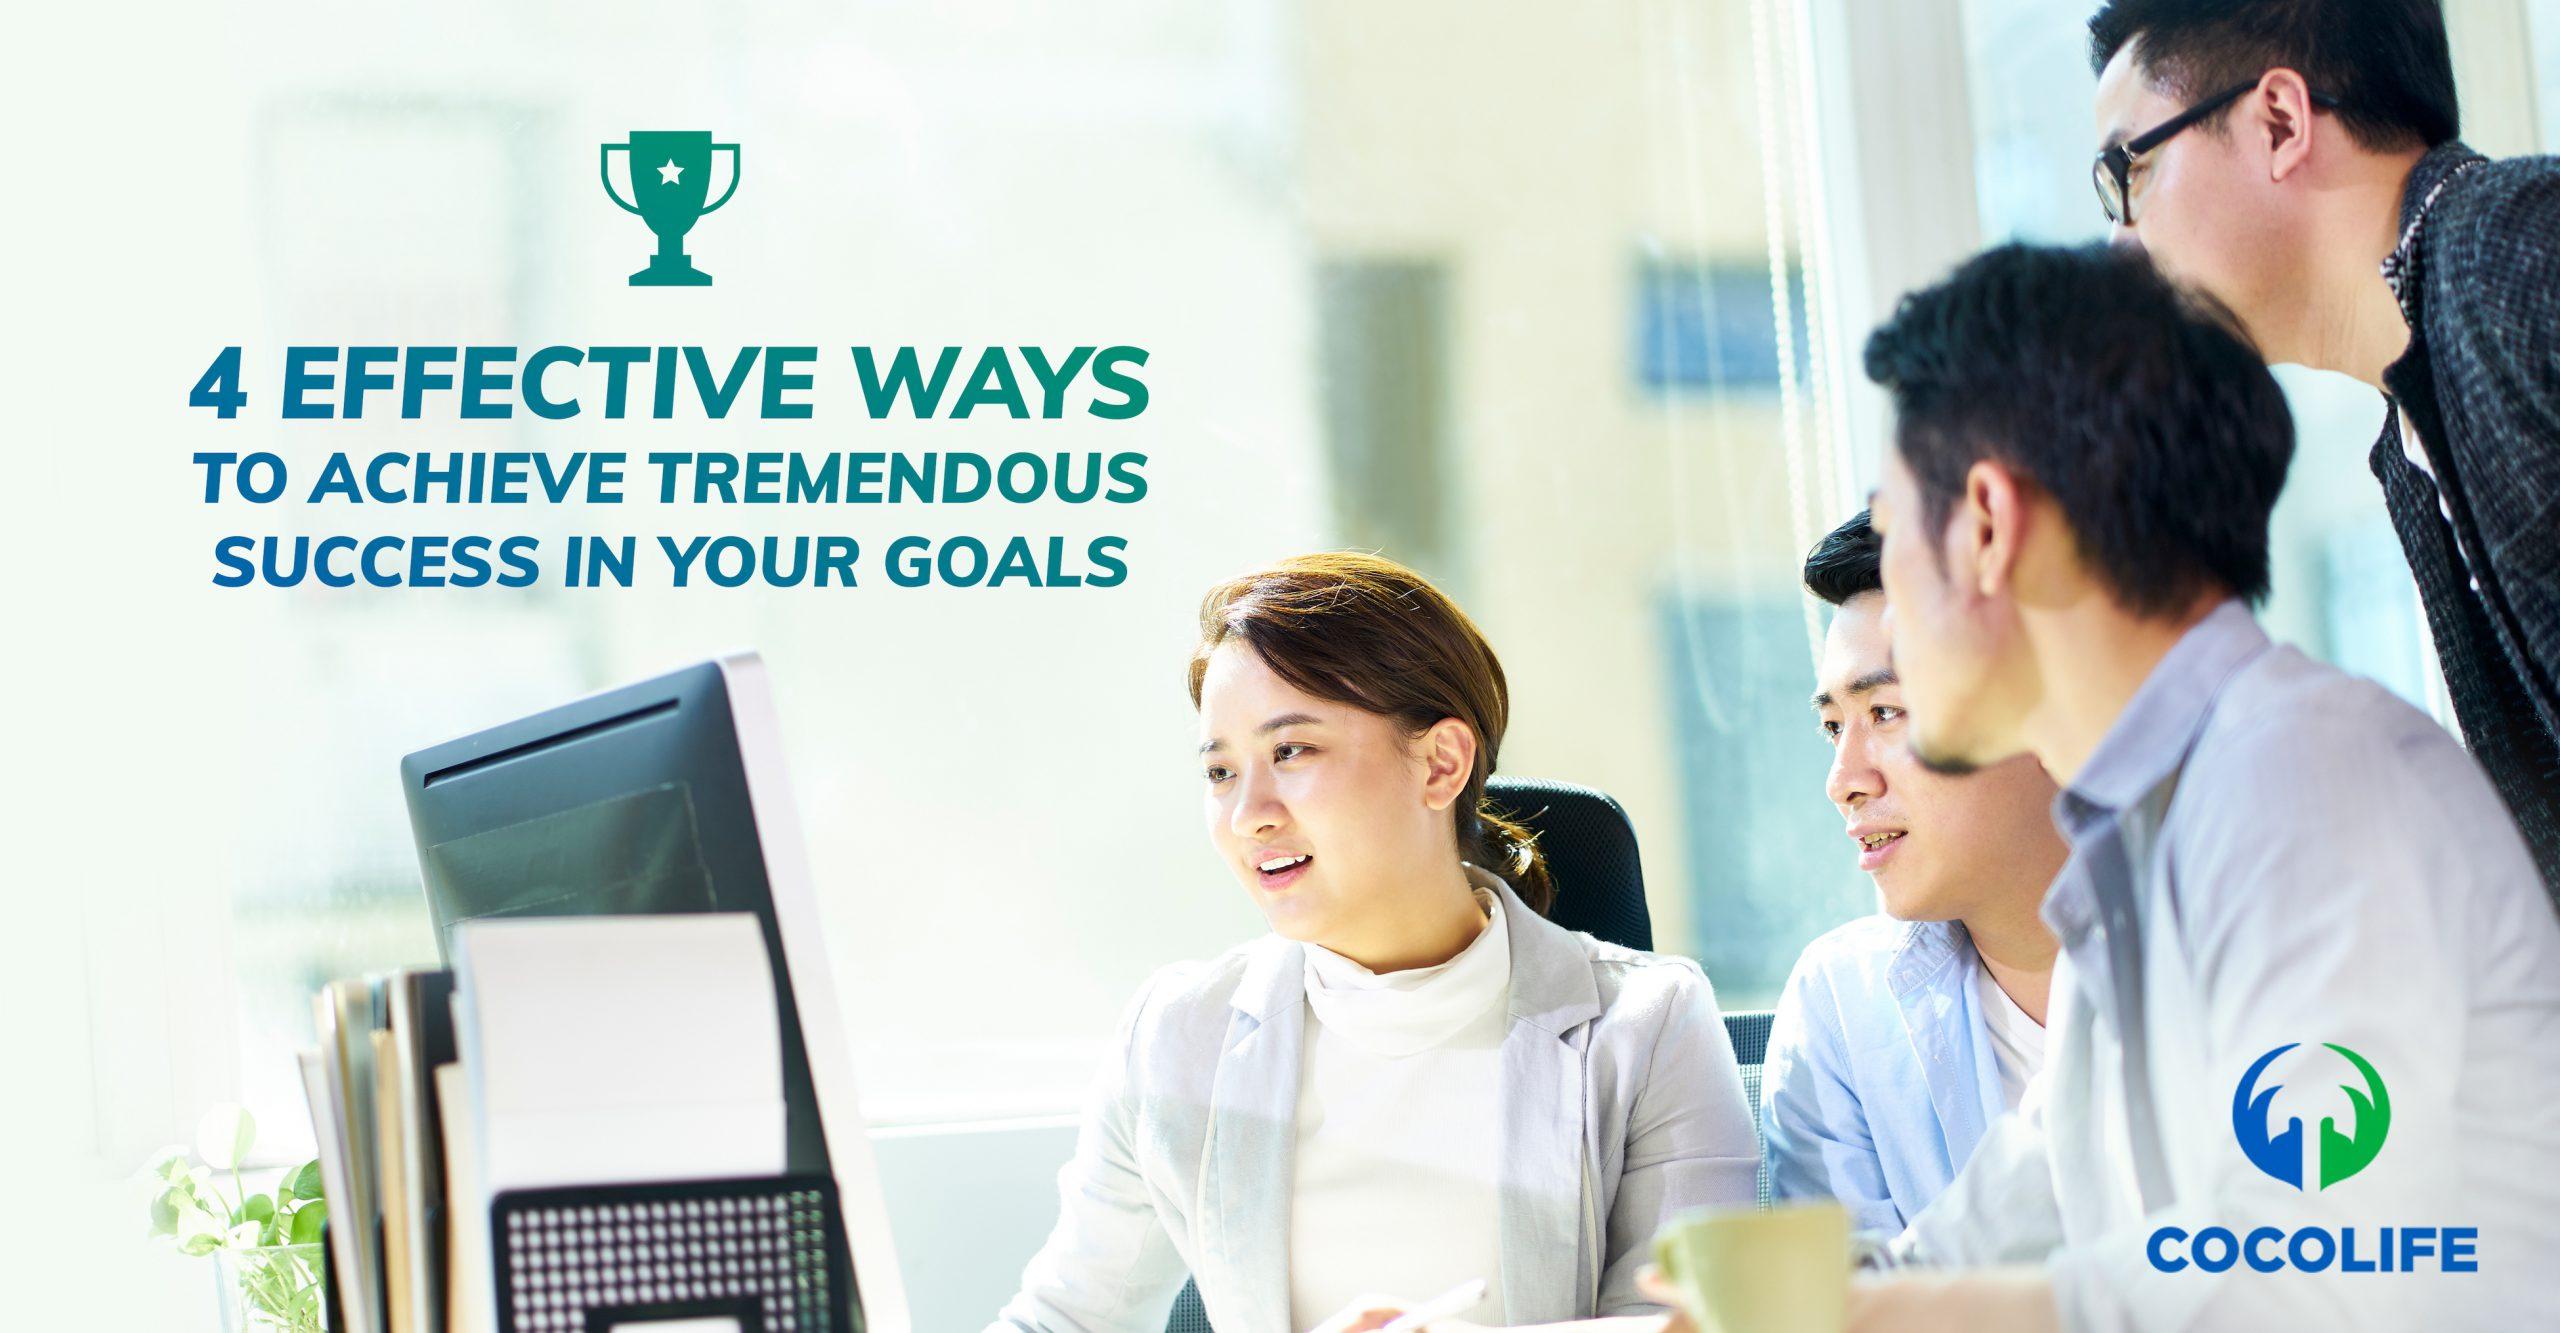 4 effective ways to achieve tremendous success in your goals